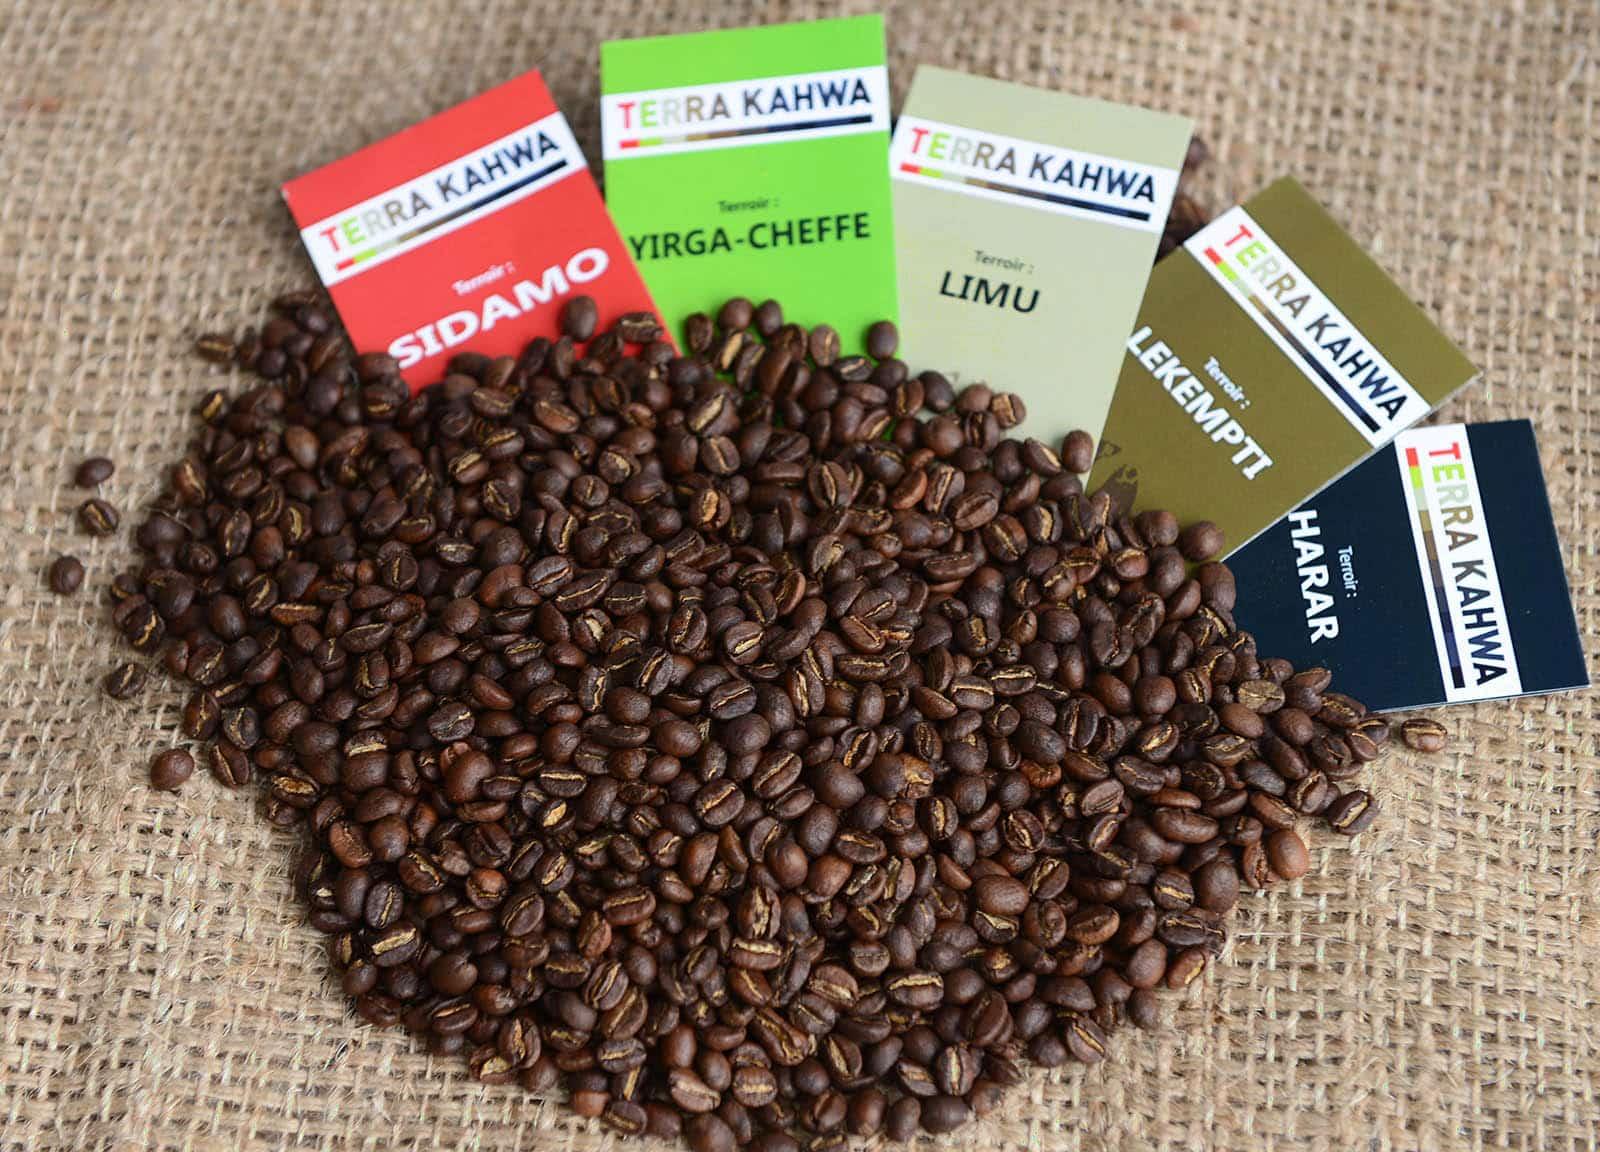 assortiment gastronome 5 grands caf s d ethiopie origine certifi e 5kg terra kahwa. Black Bedroom Furniture Sets. Home Design Ideas